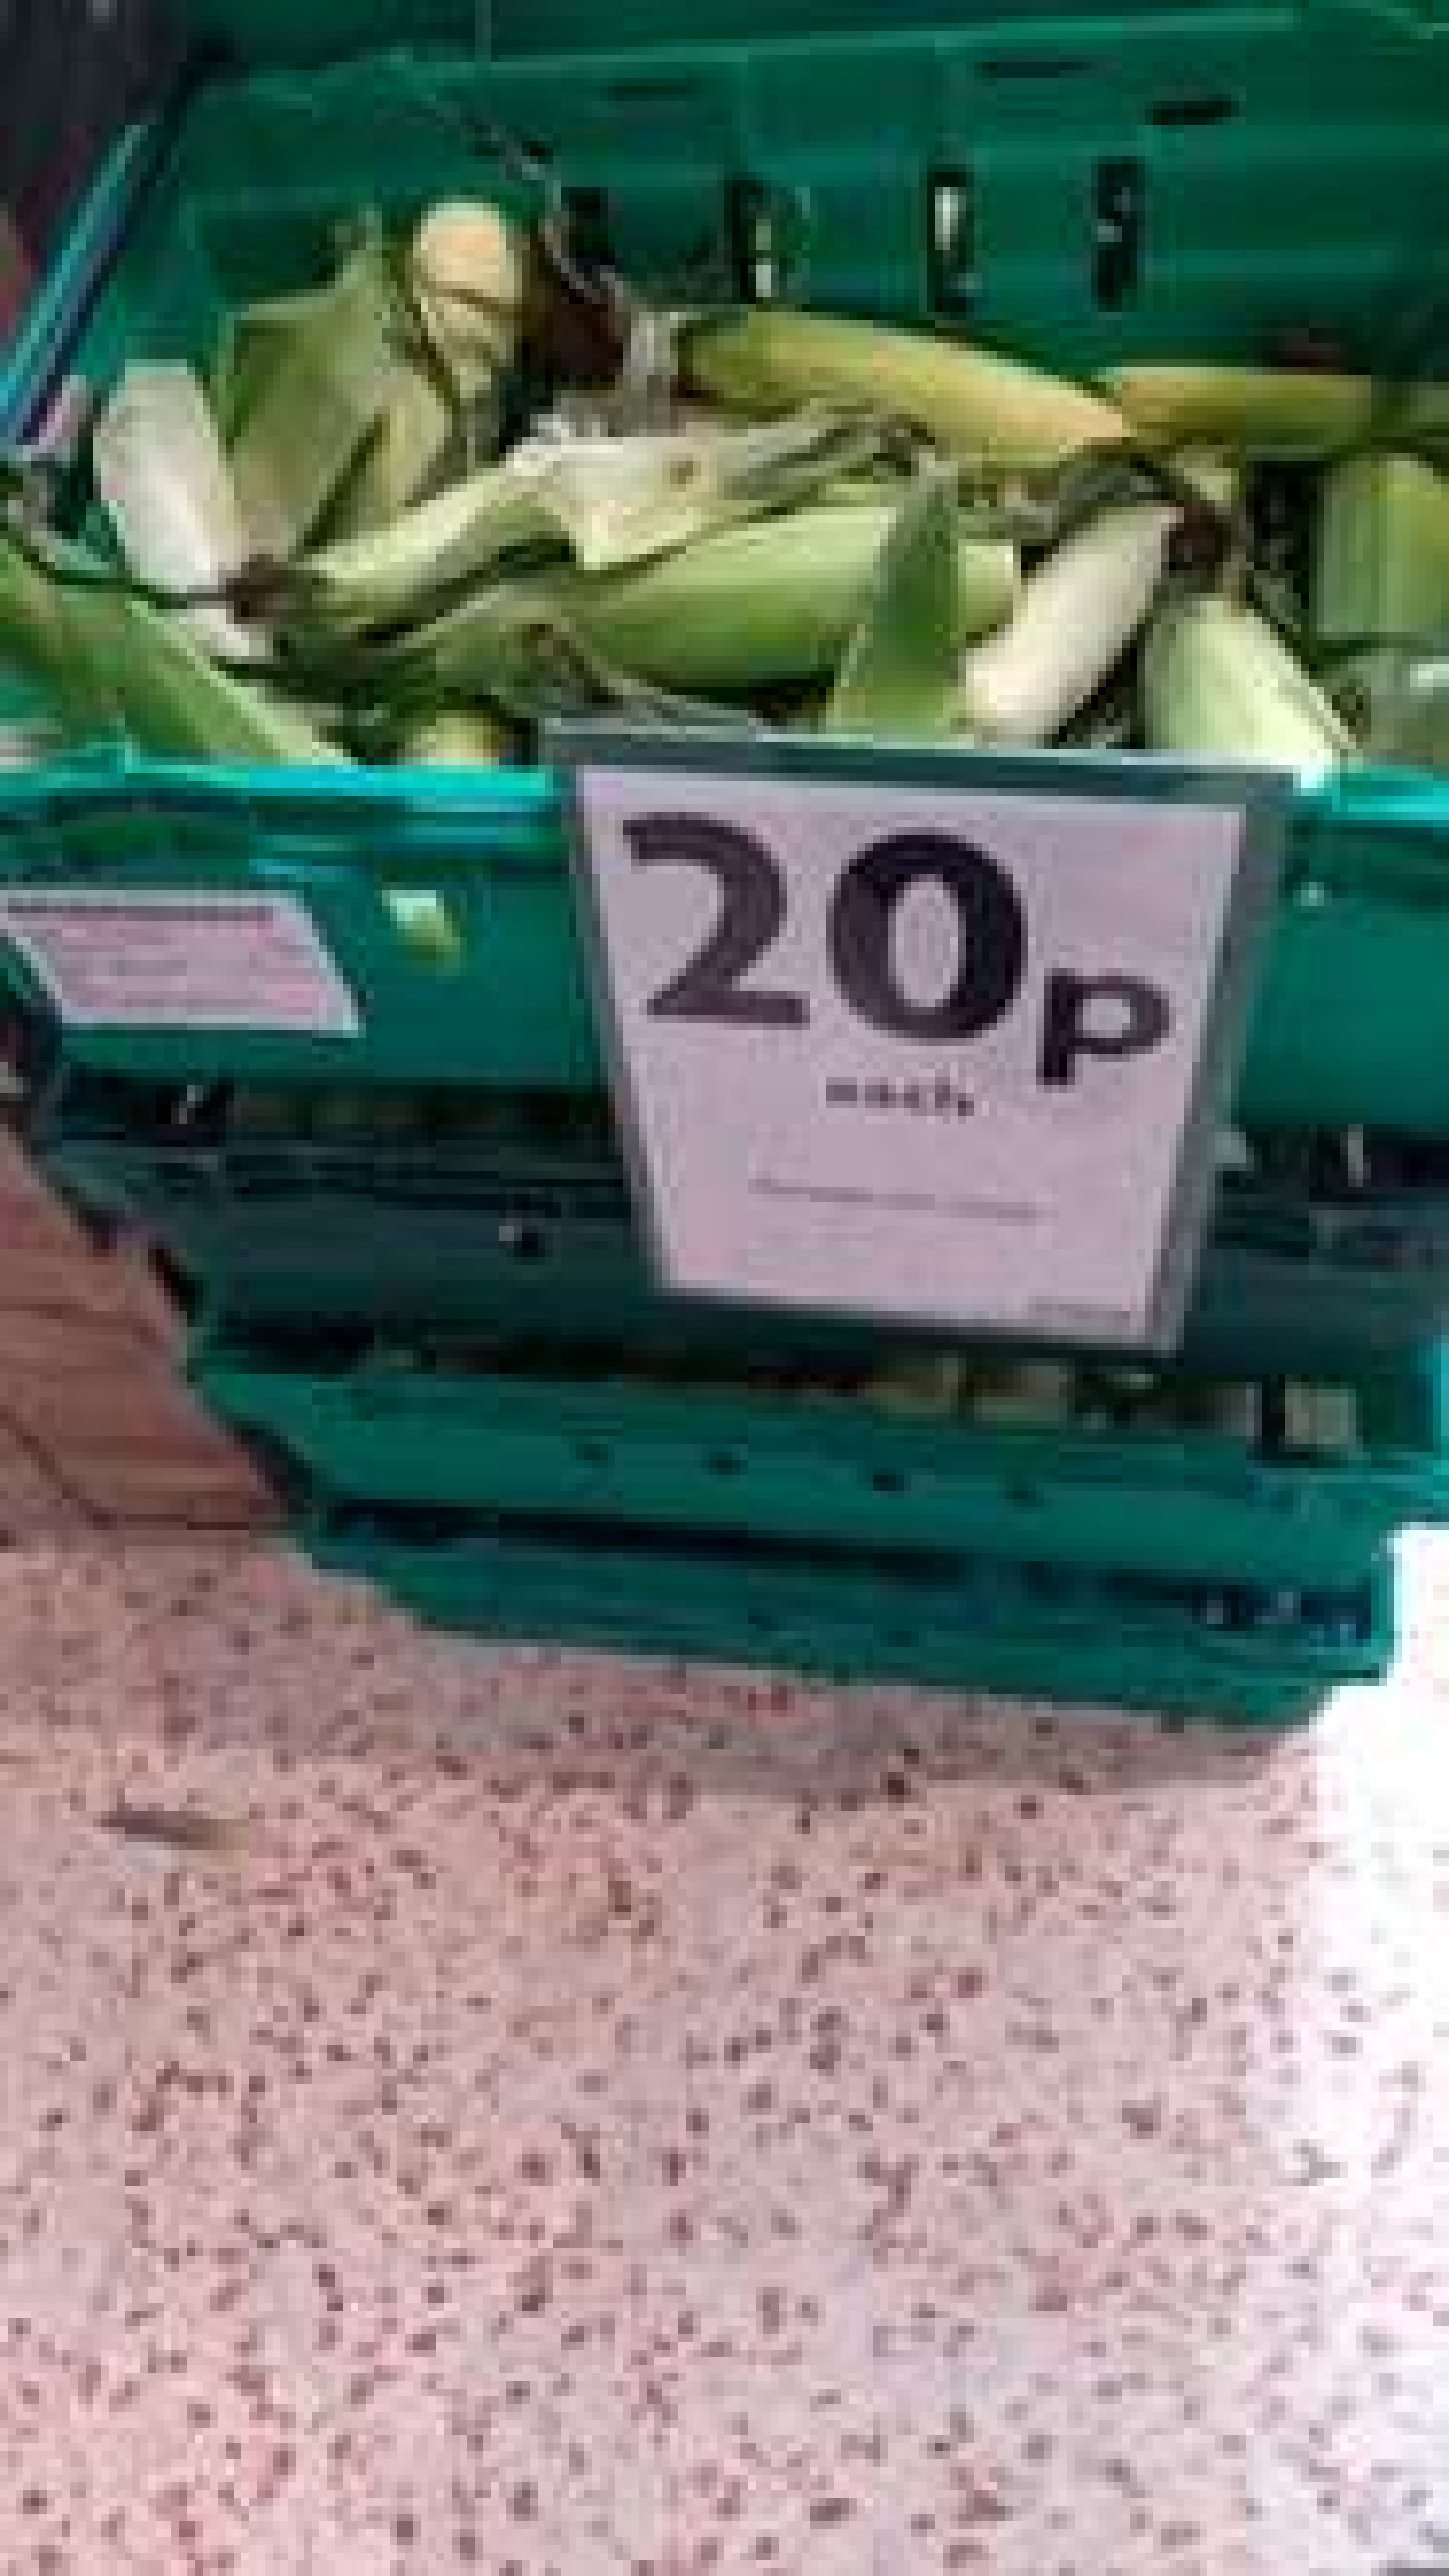 Whole Sweet Corn Cobs 20p each @ Morrisons